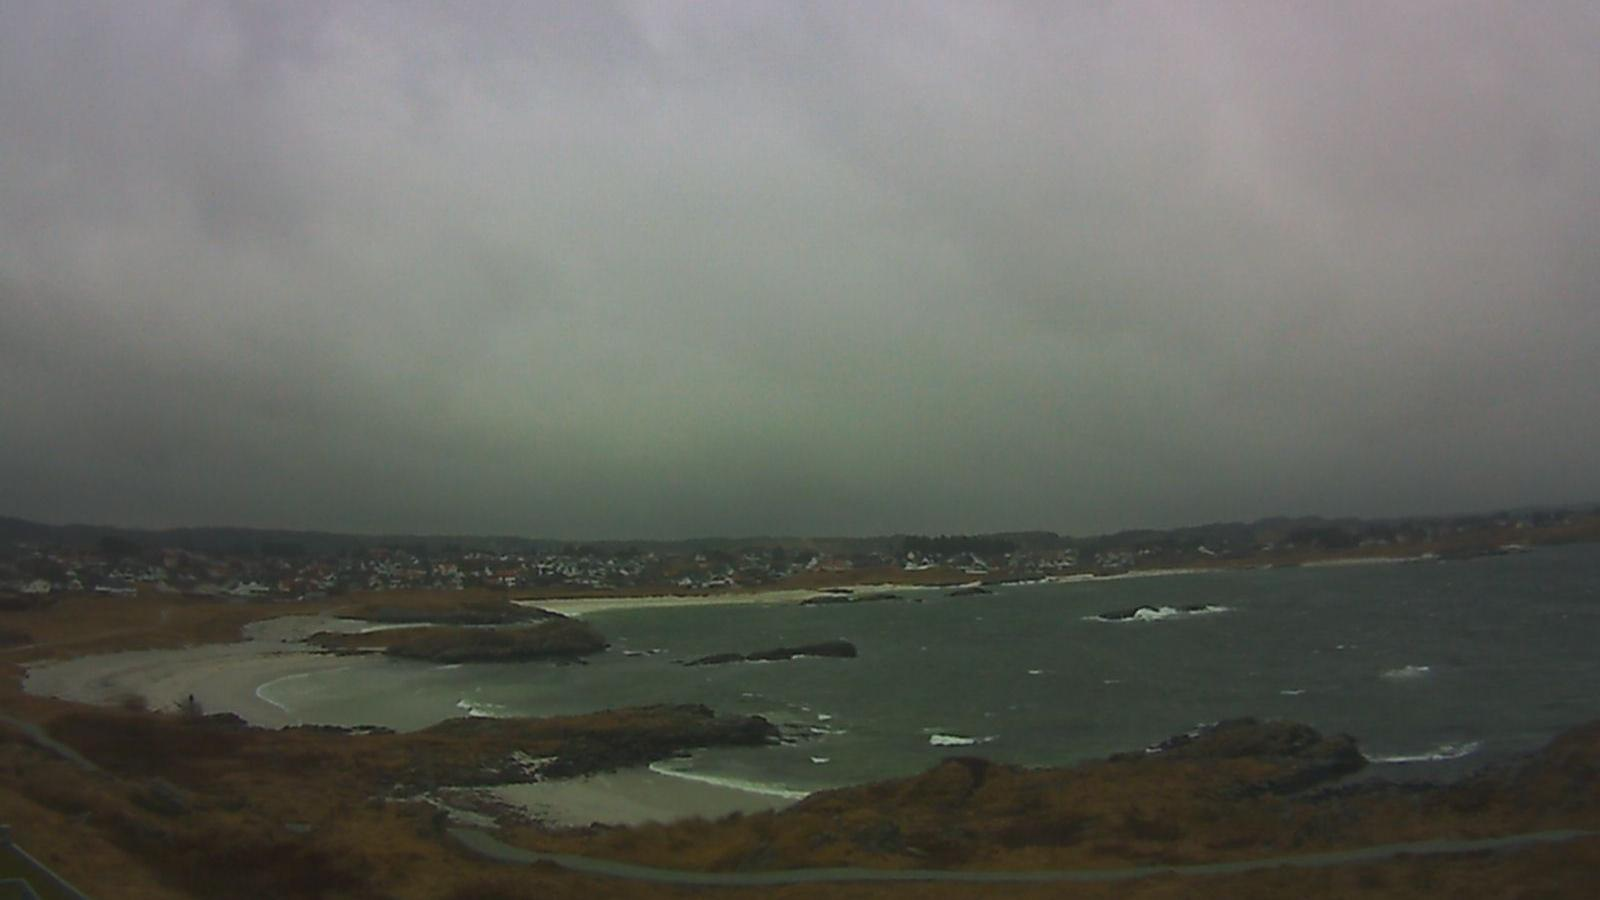 Webkamera Åkrehamn › South-West: Åkrasanden